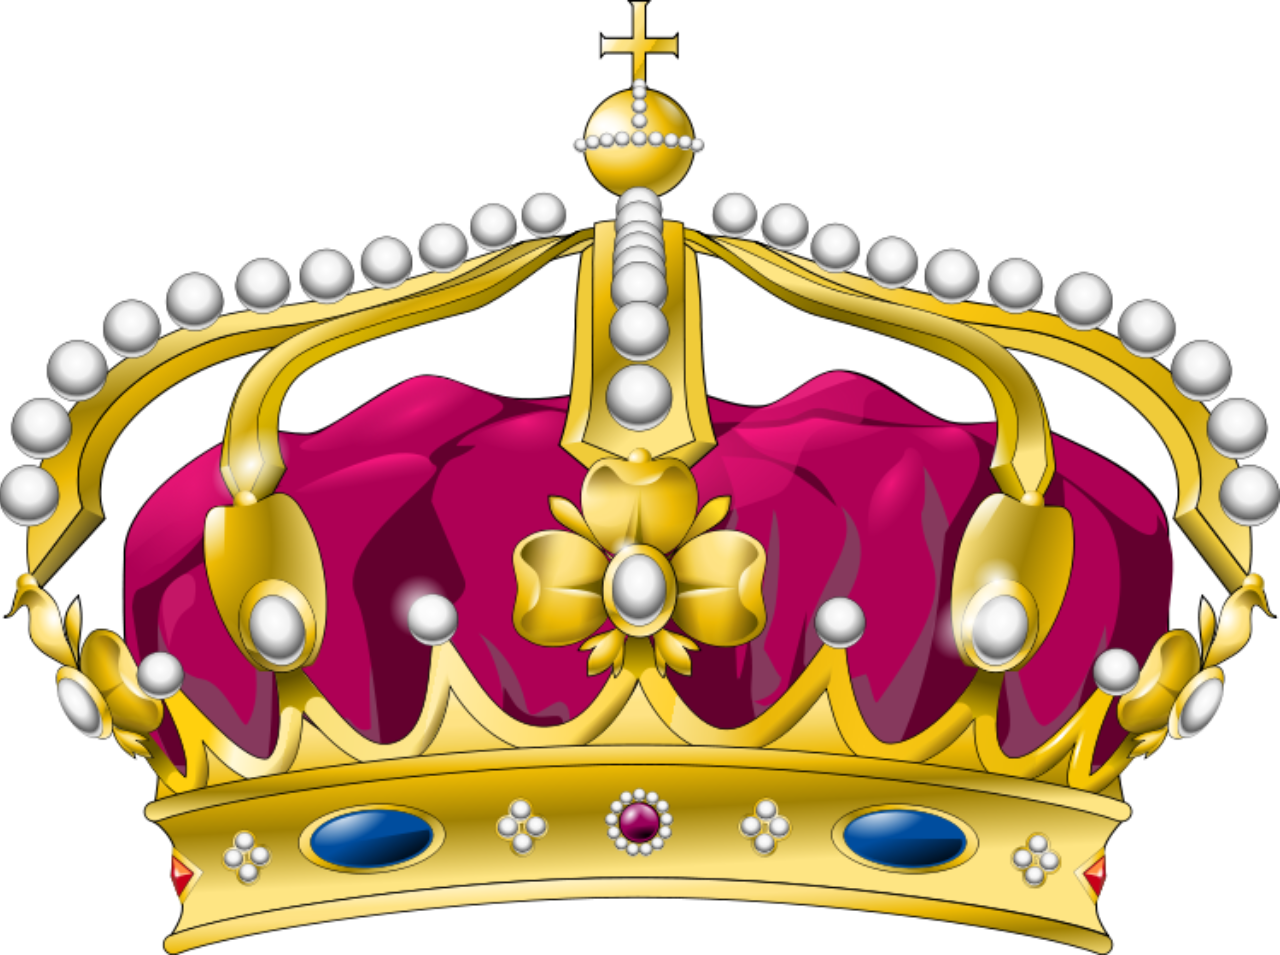 Download Crown Clipart No Background - Queen Crown ...